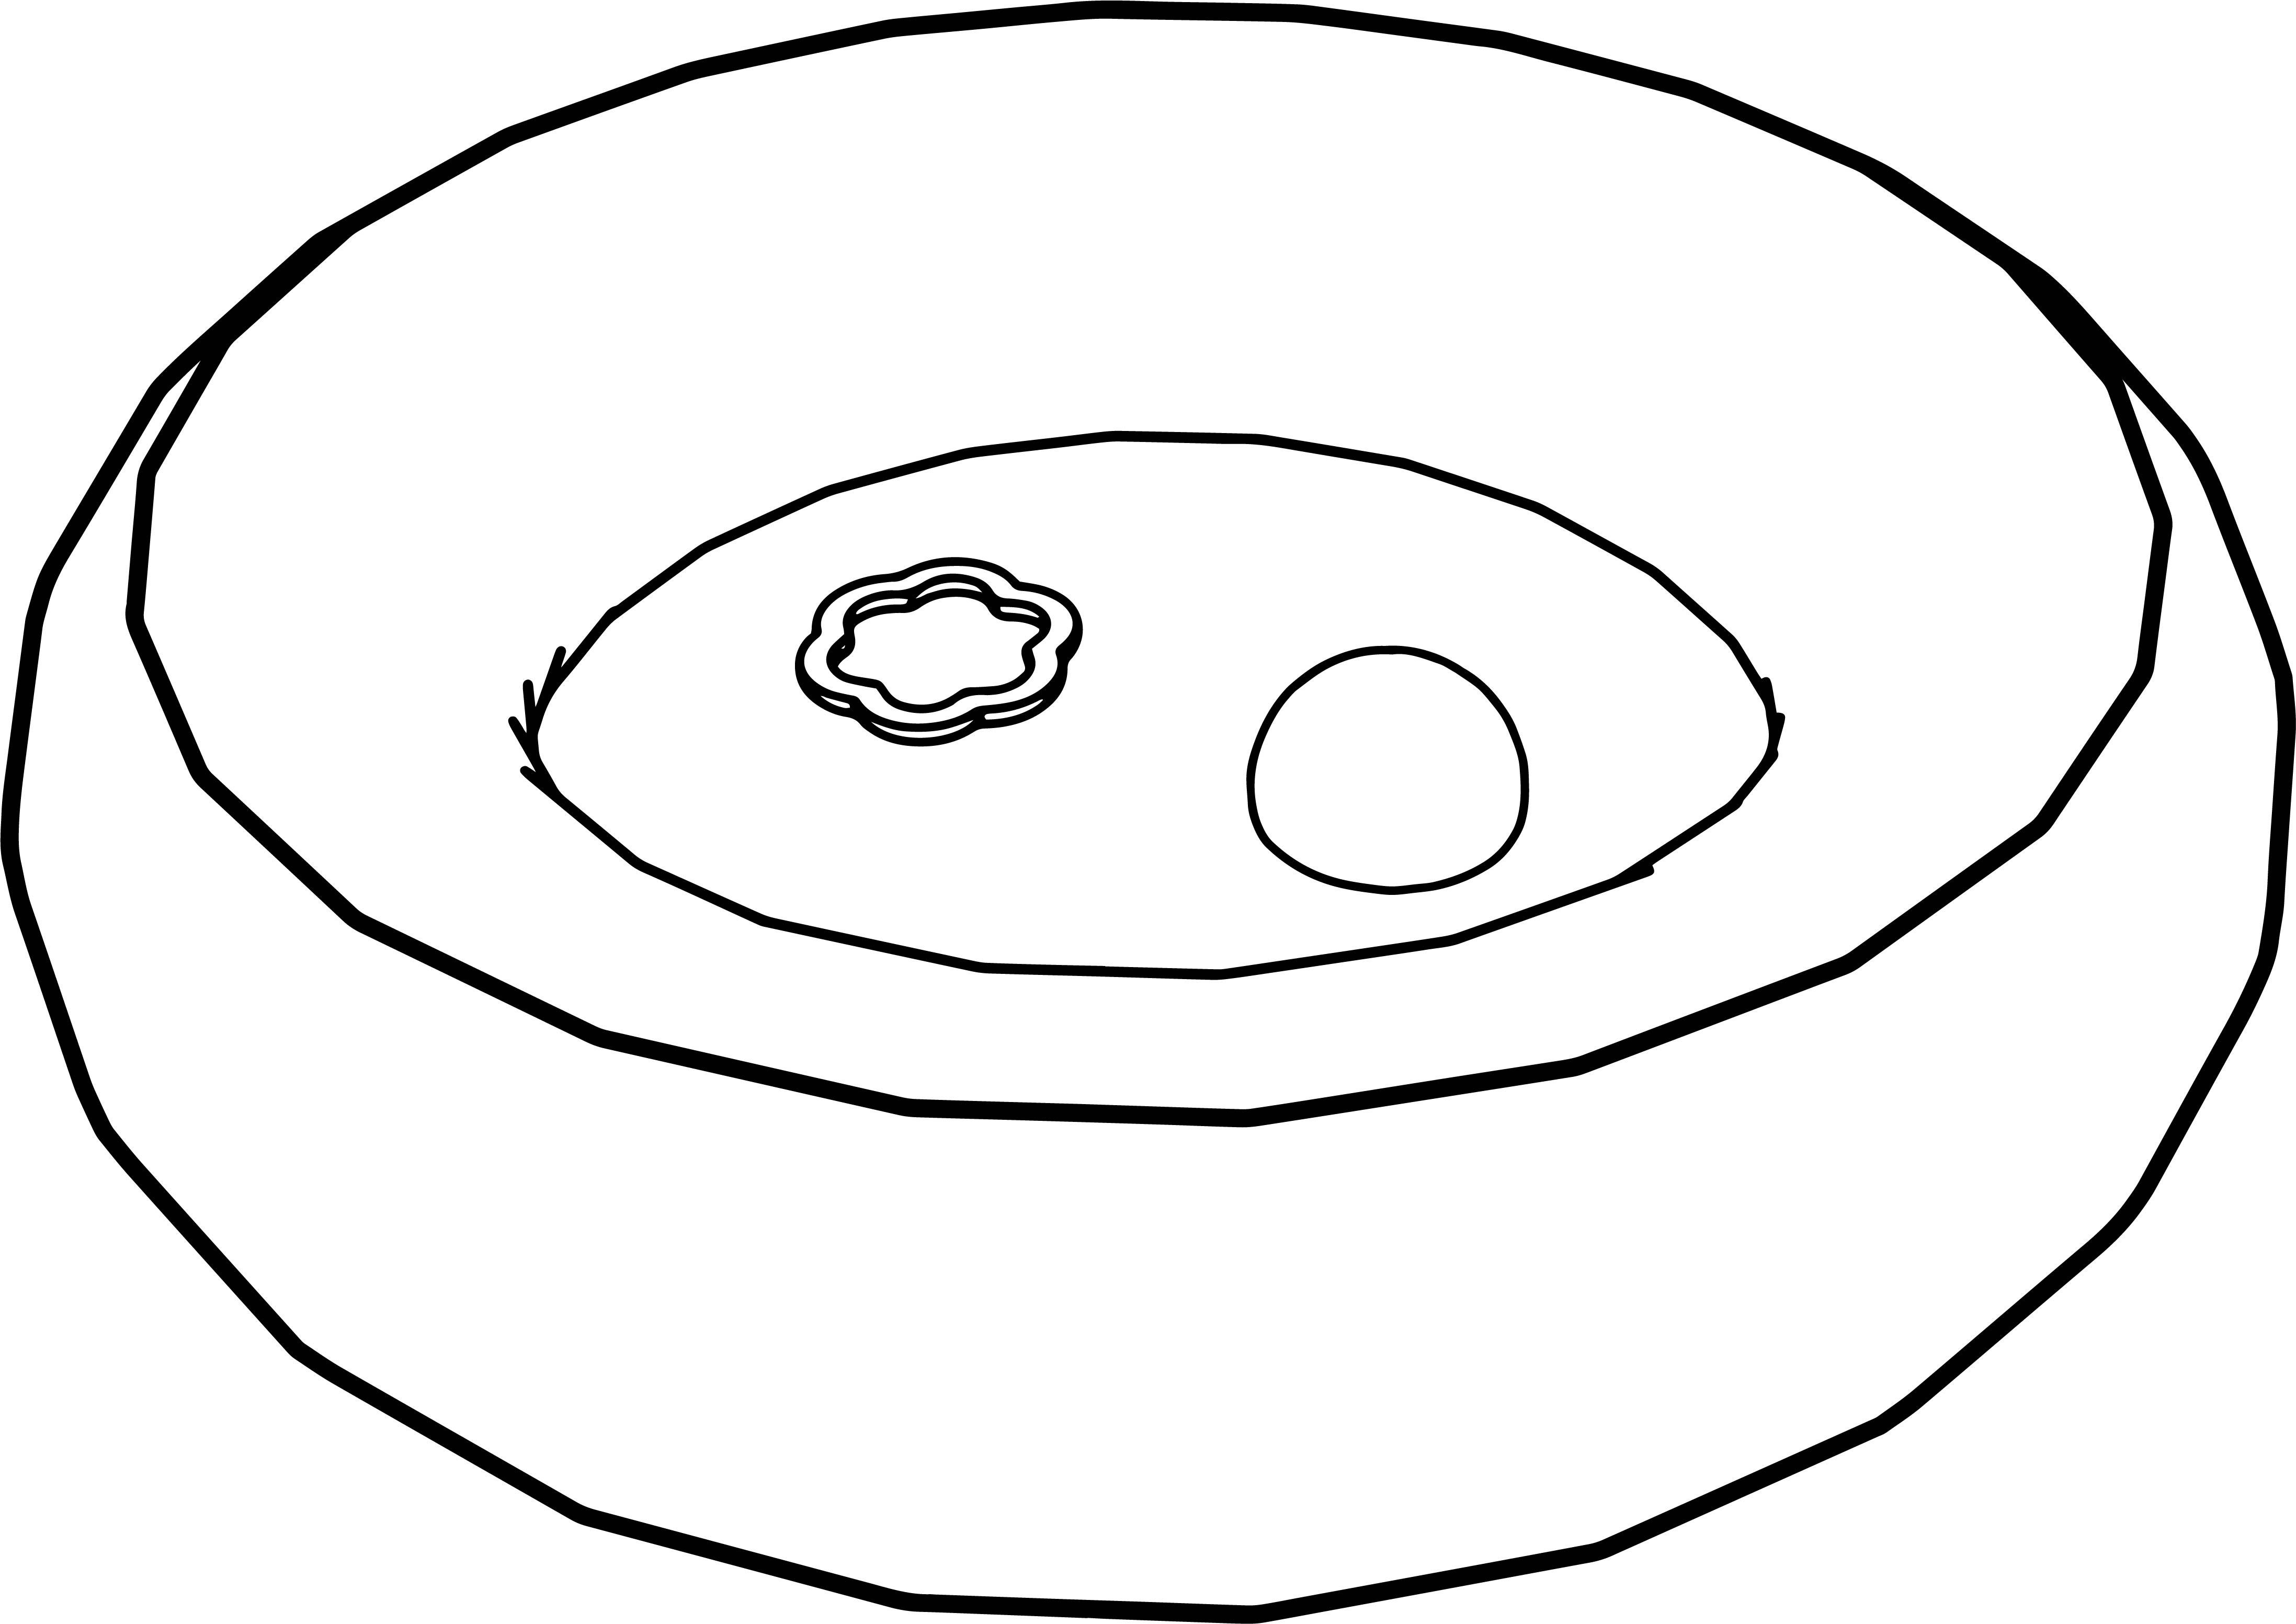 Cartoon Pool Coloring Page